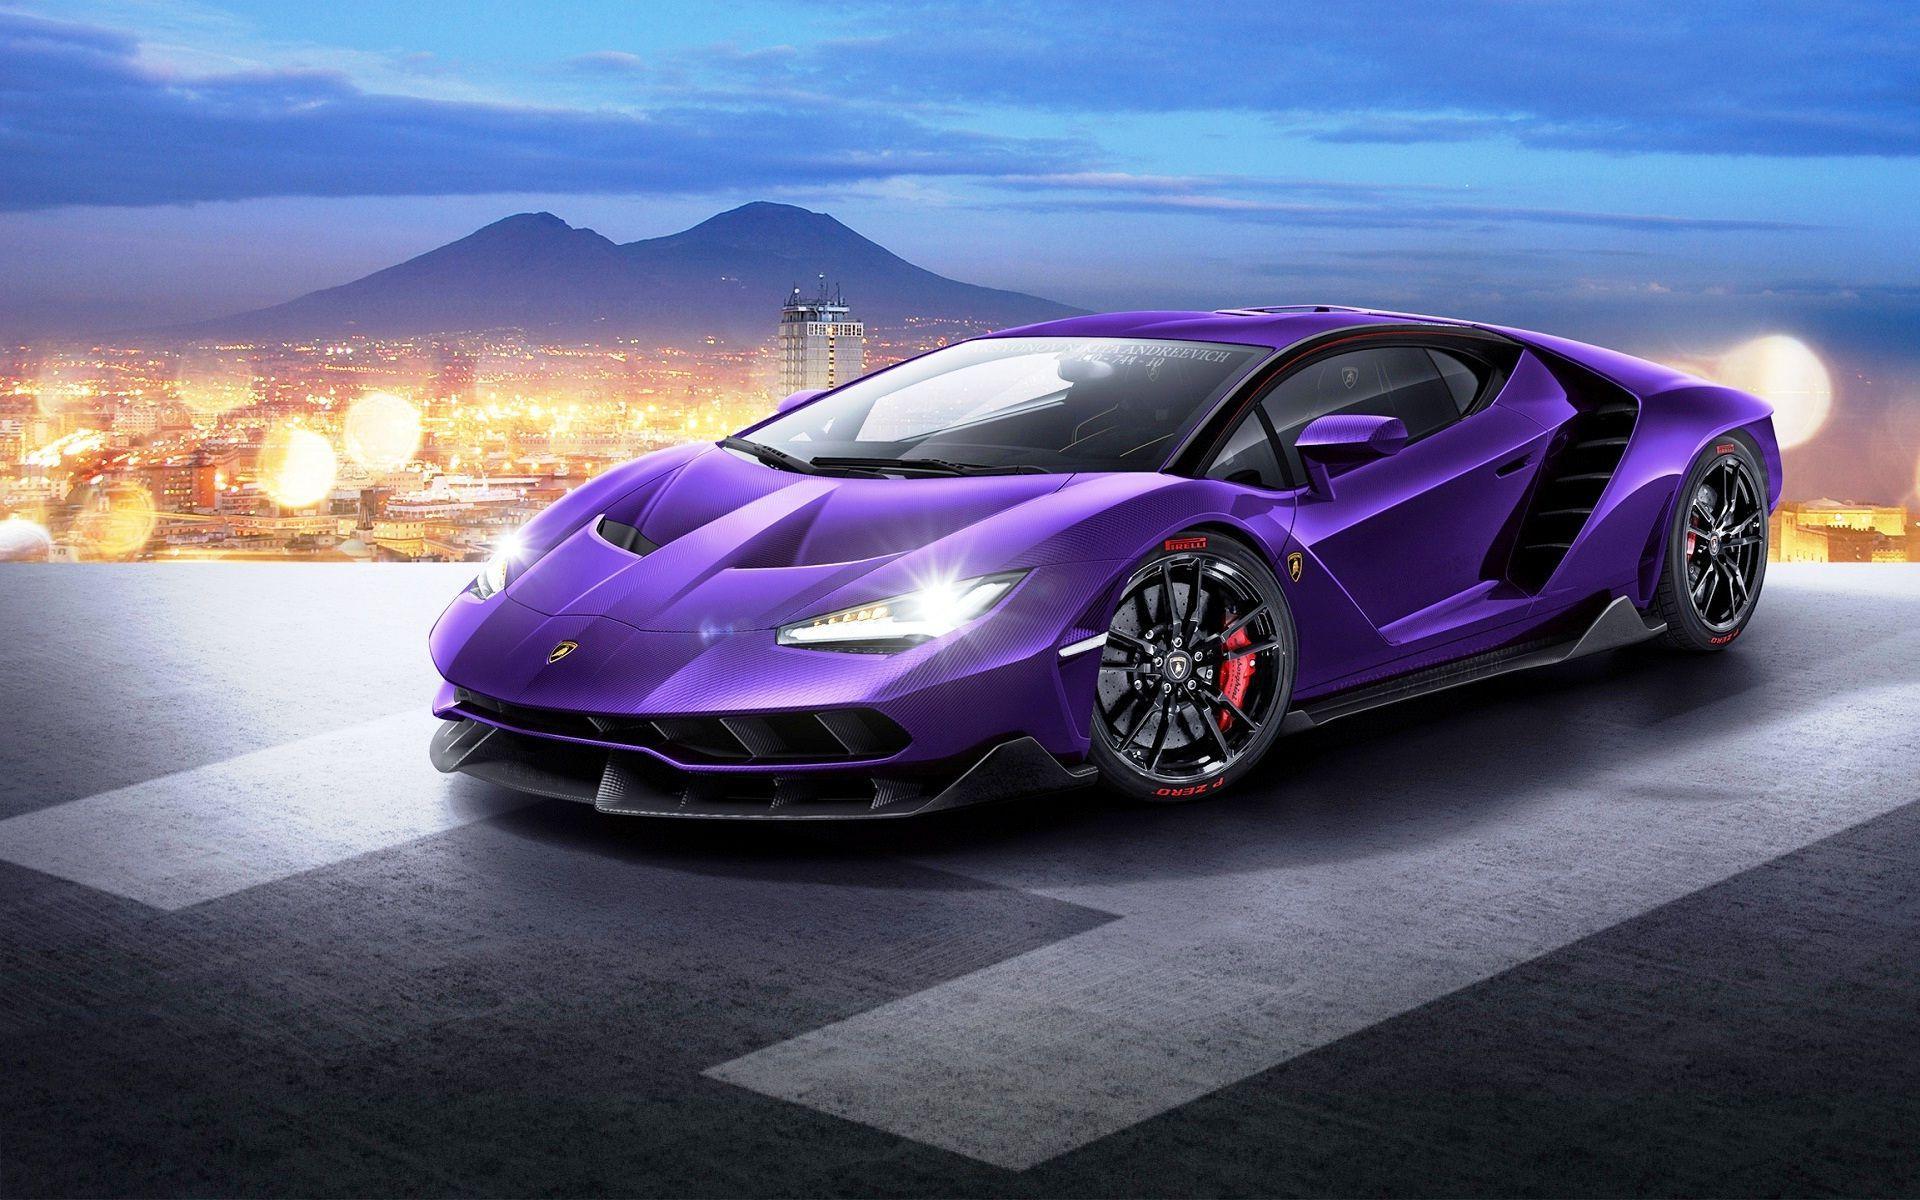 41 Best Free Purple Car Hd Wallpapers Wallpaperaccess